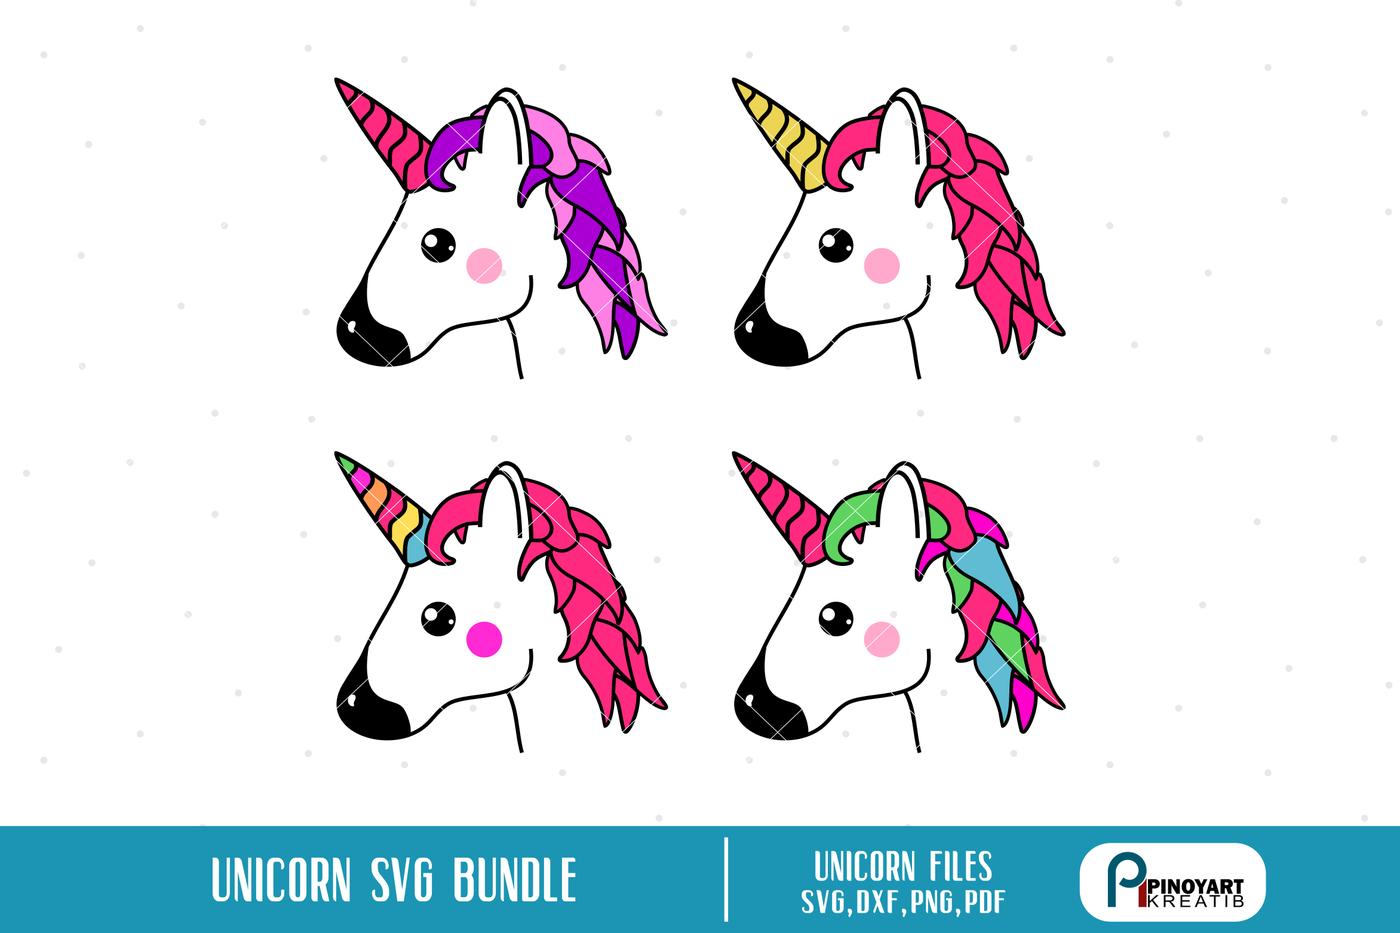 Unicorn Svg Unicorn Svg File Unicorn Dxf File Unicorn Clip Art